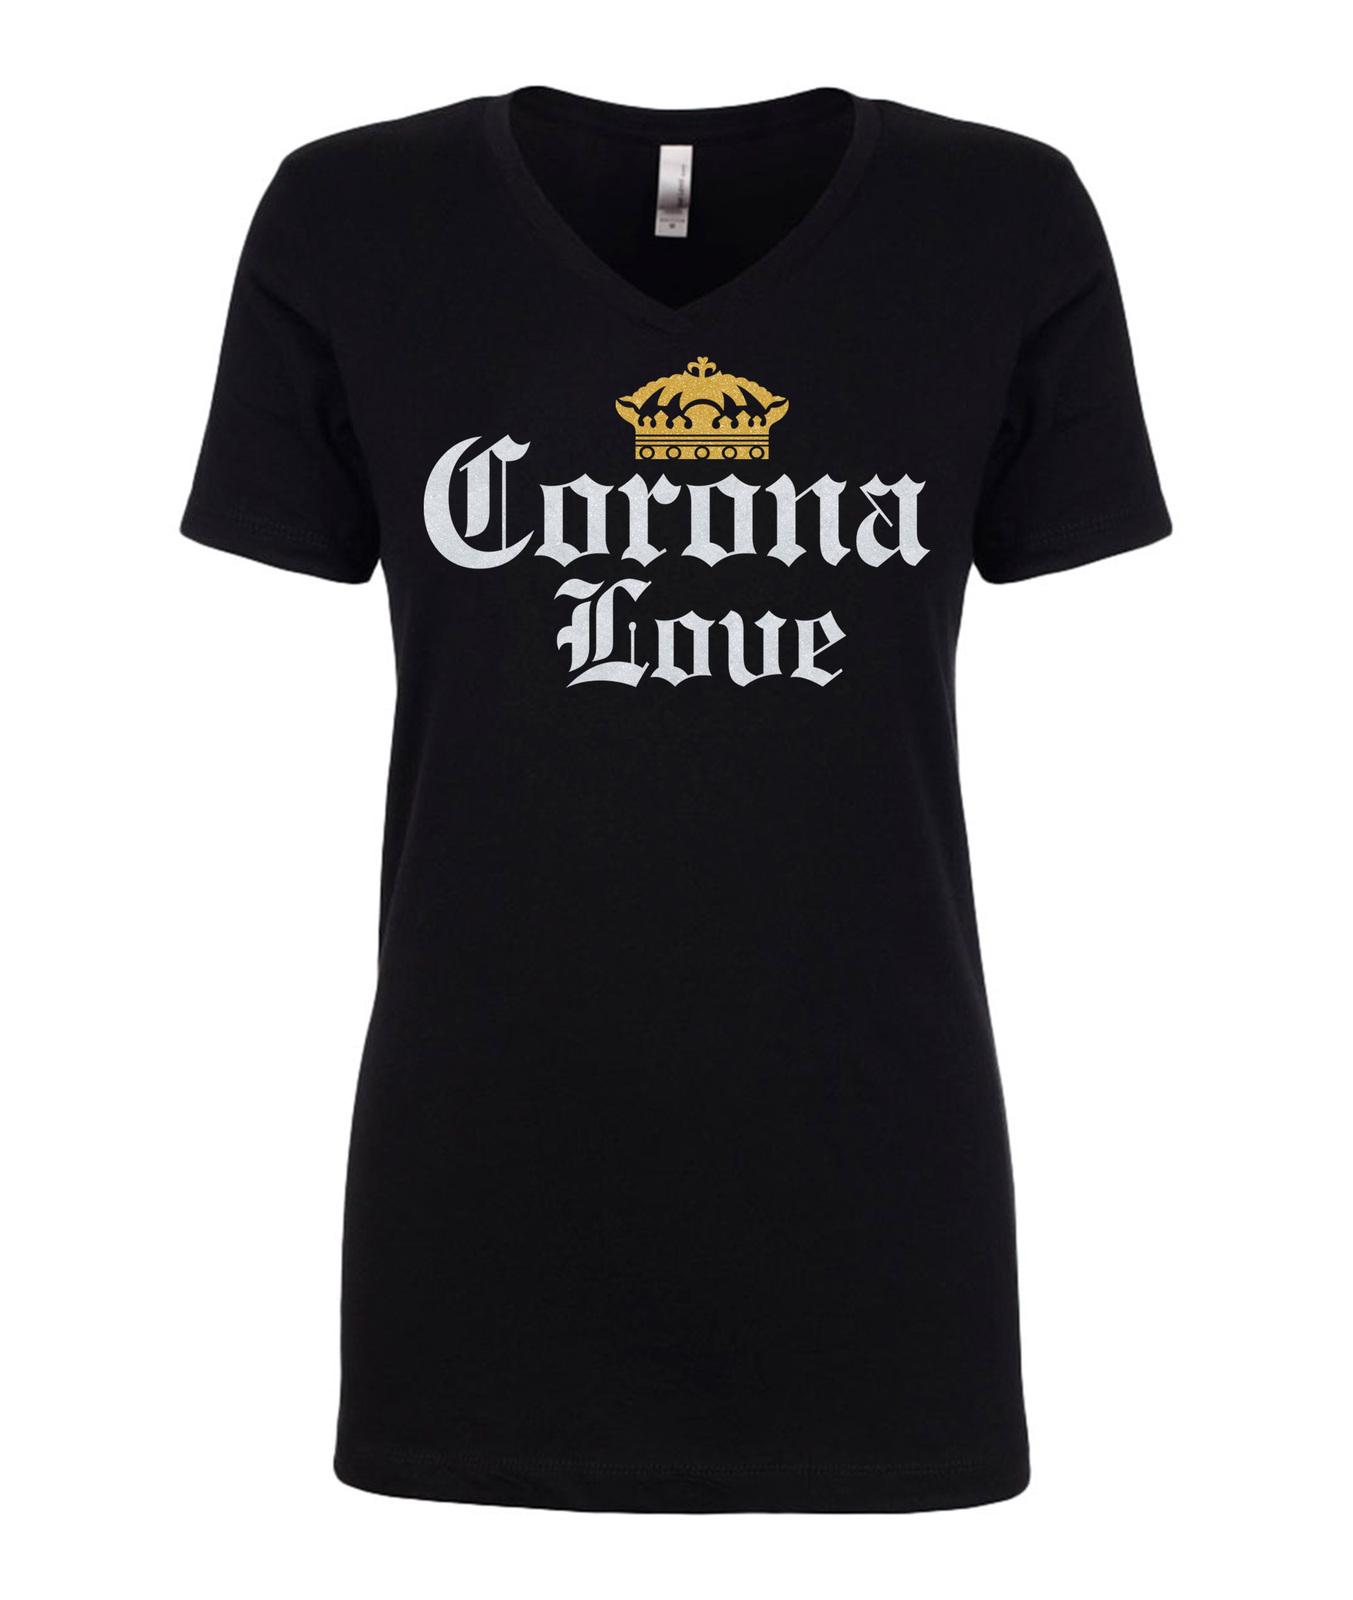 corona love corona t shirt, women's sparkle glitter graphic apparel top shirt